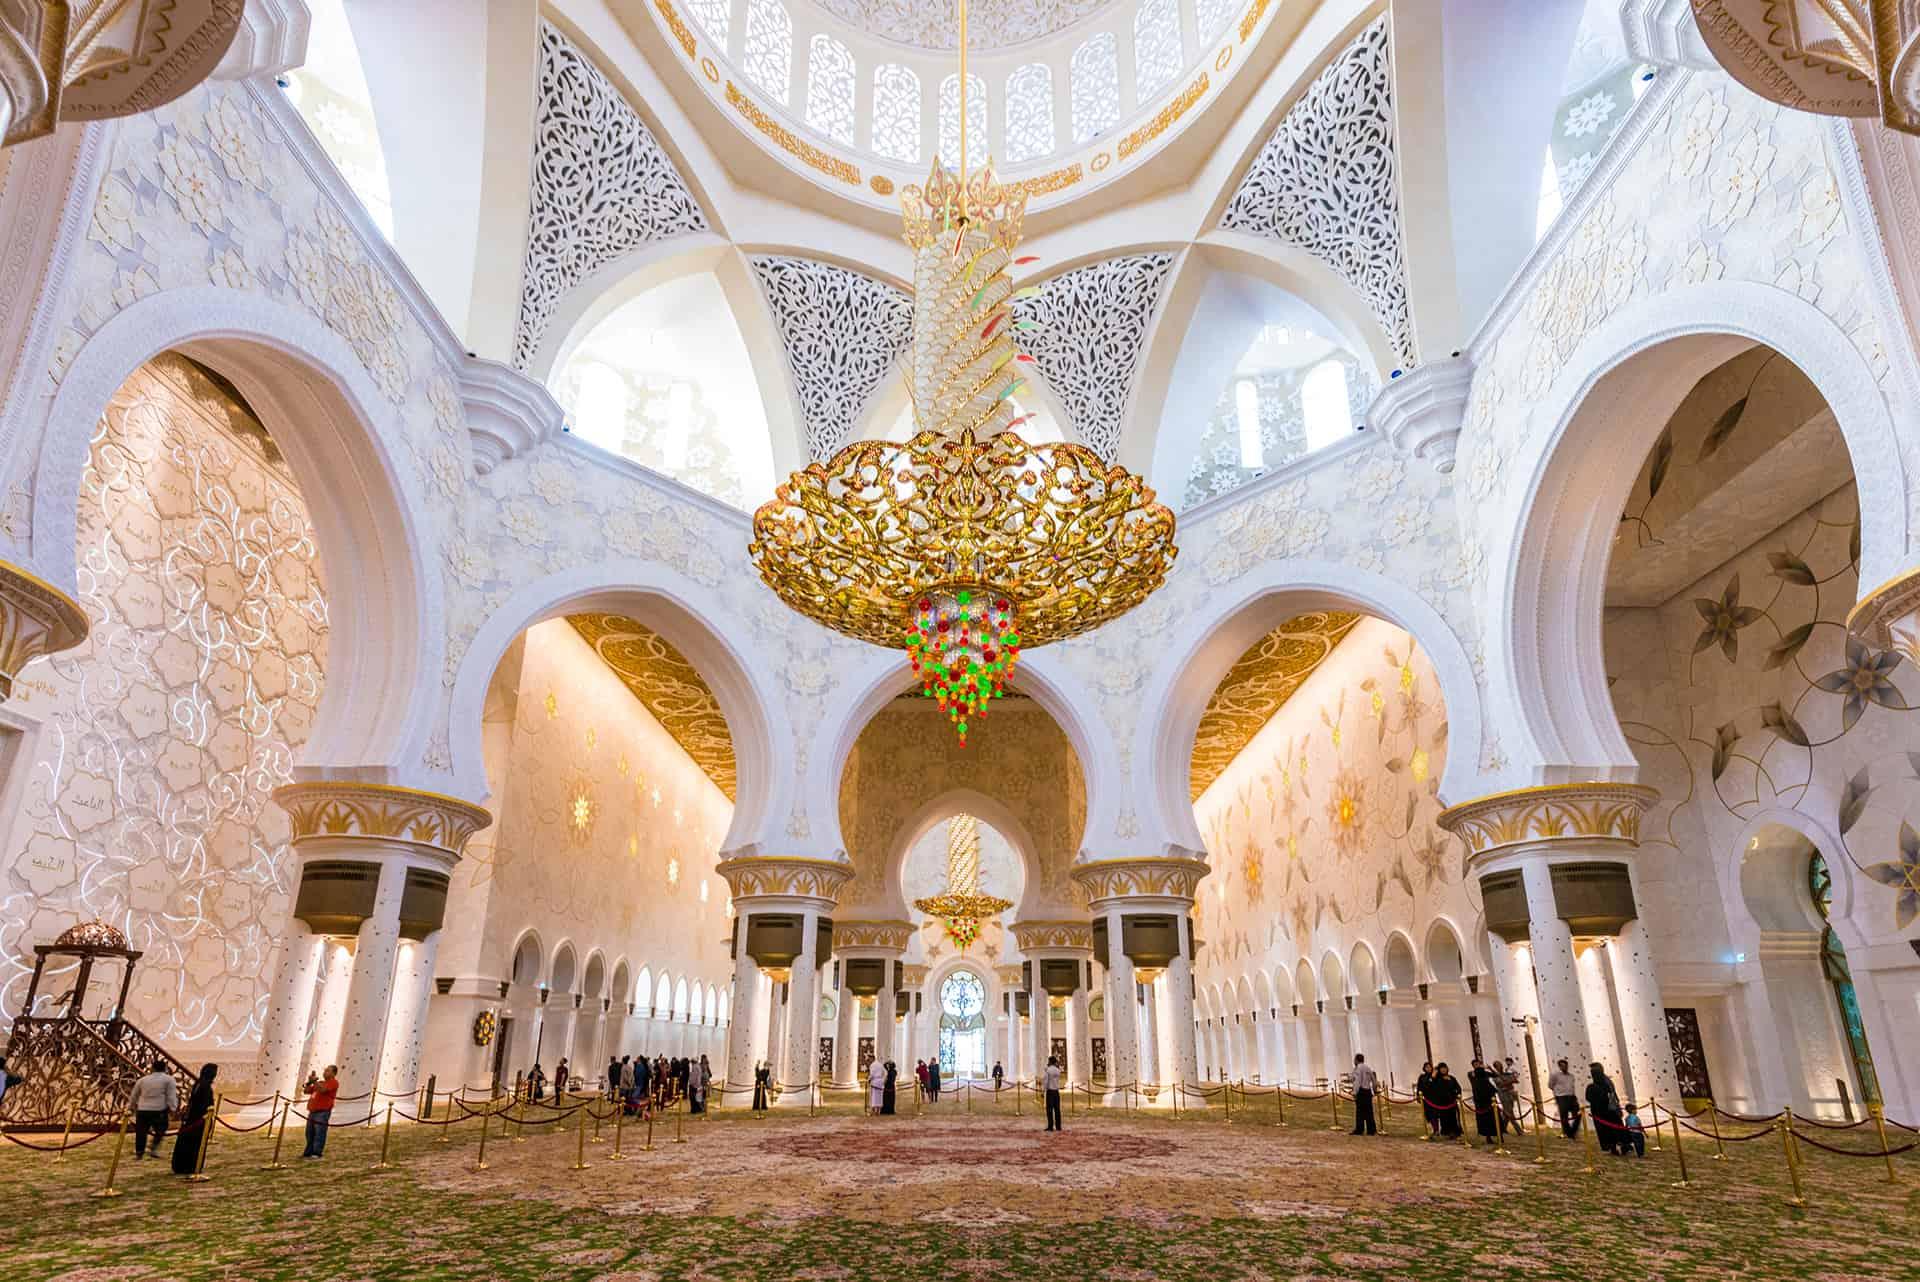 visite interieur mosquee